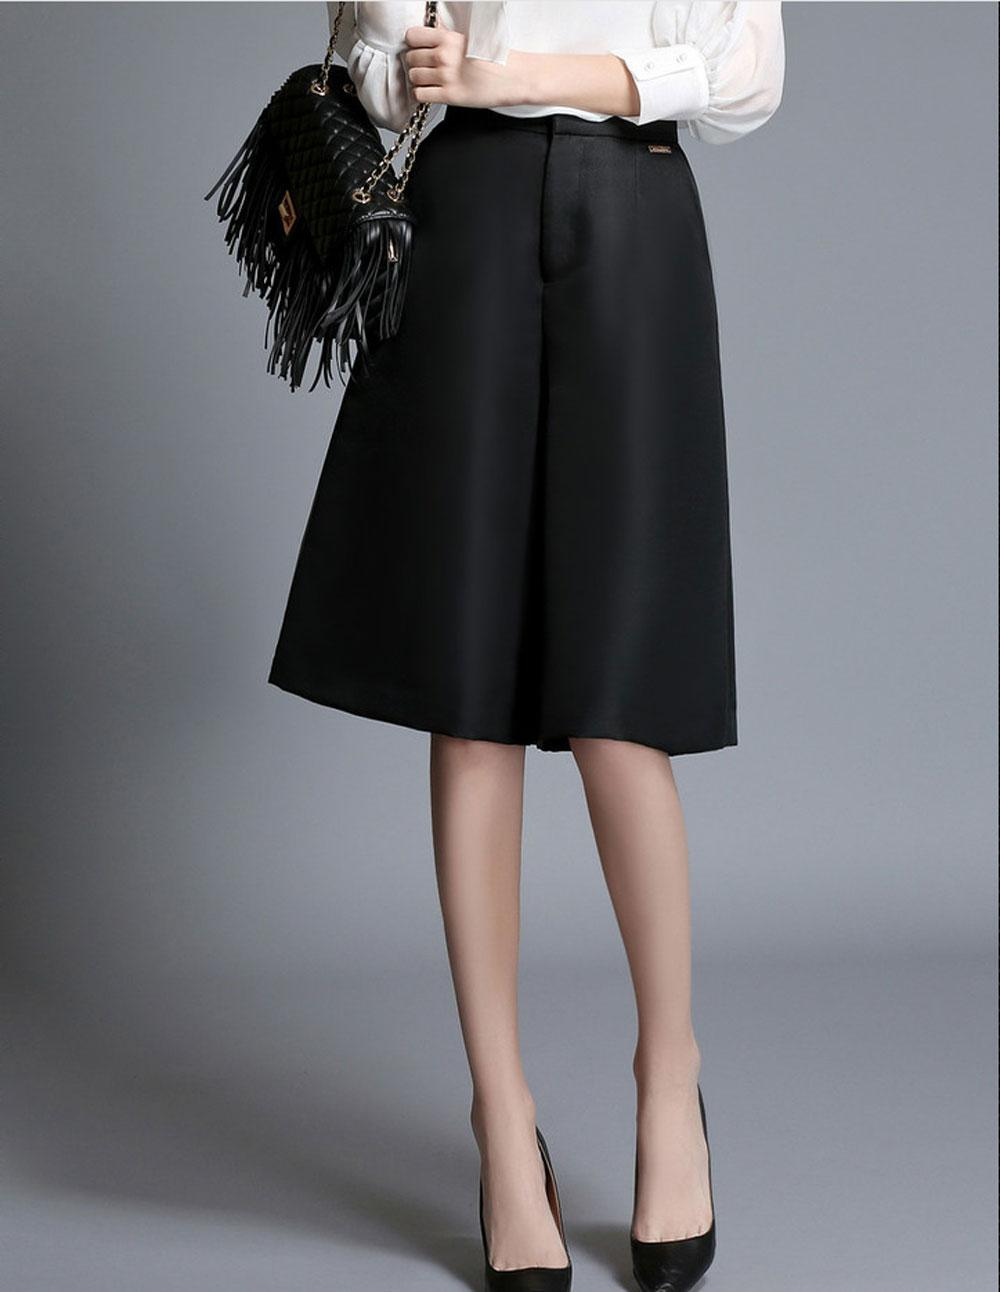 2017 Fashion Women Black High Waisted A Line Wide Leg Pants Shorts ...